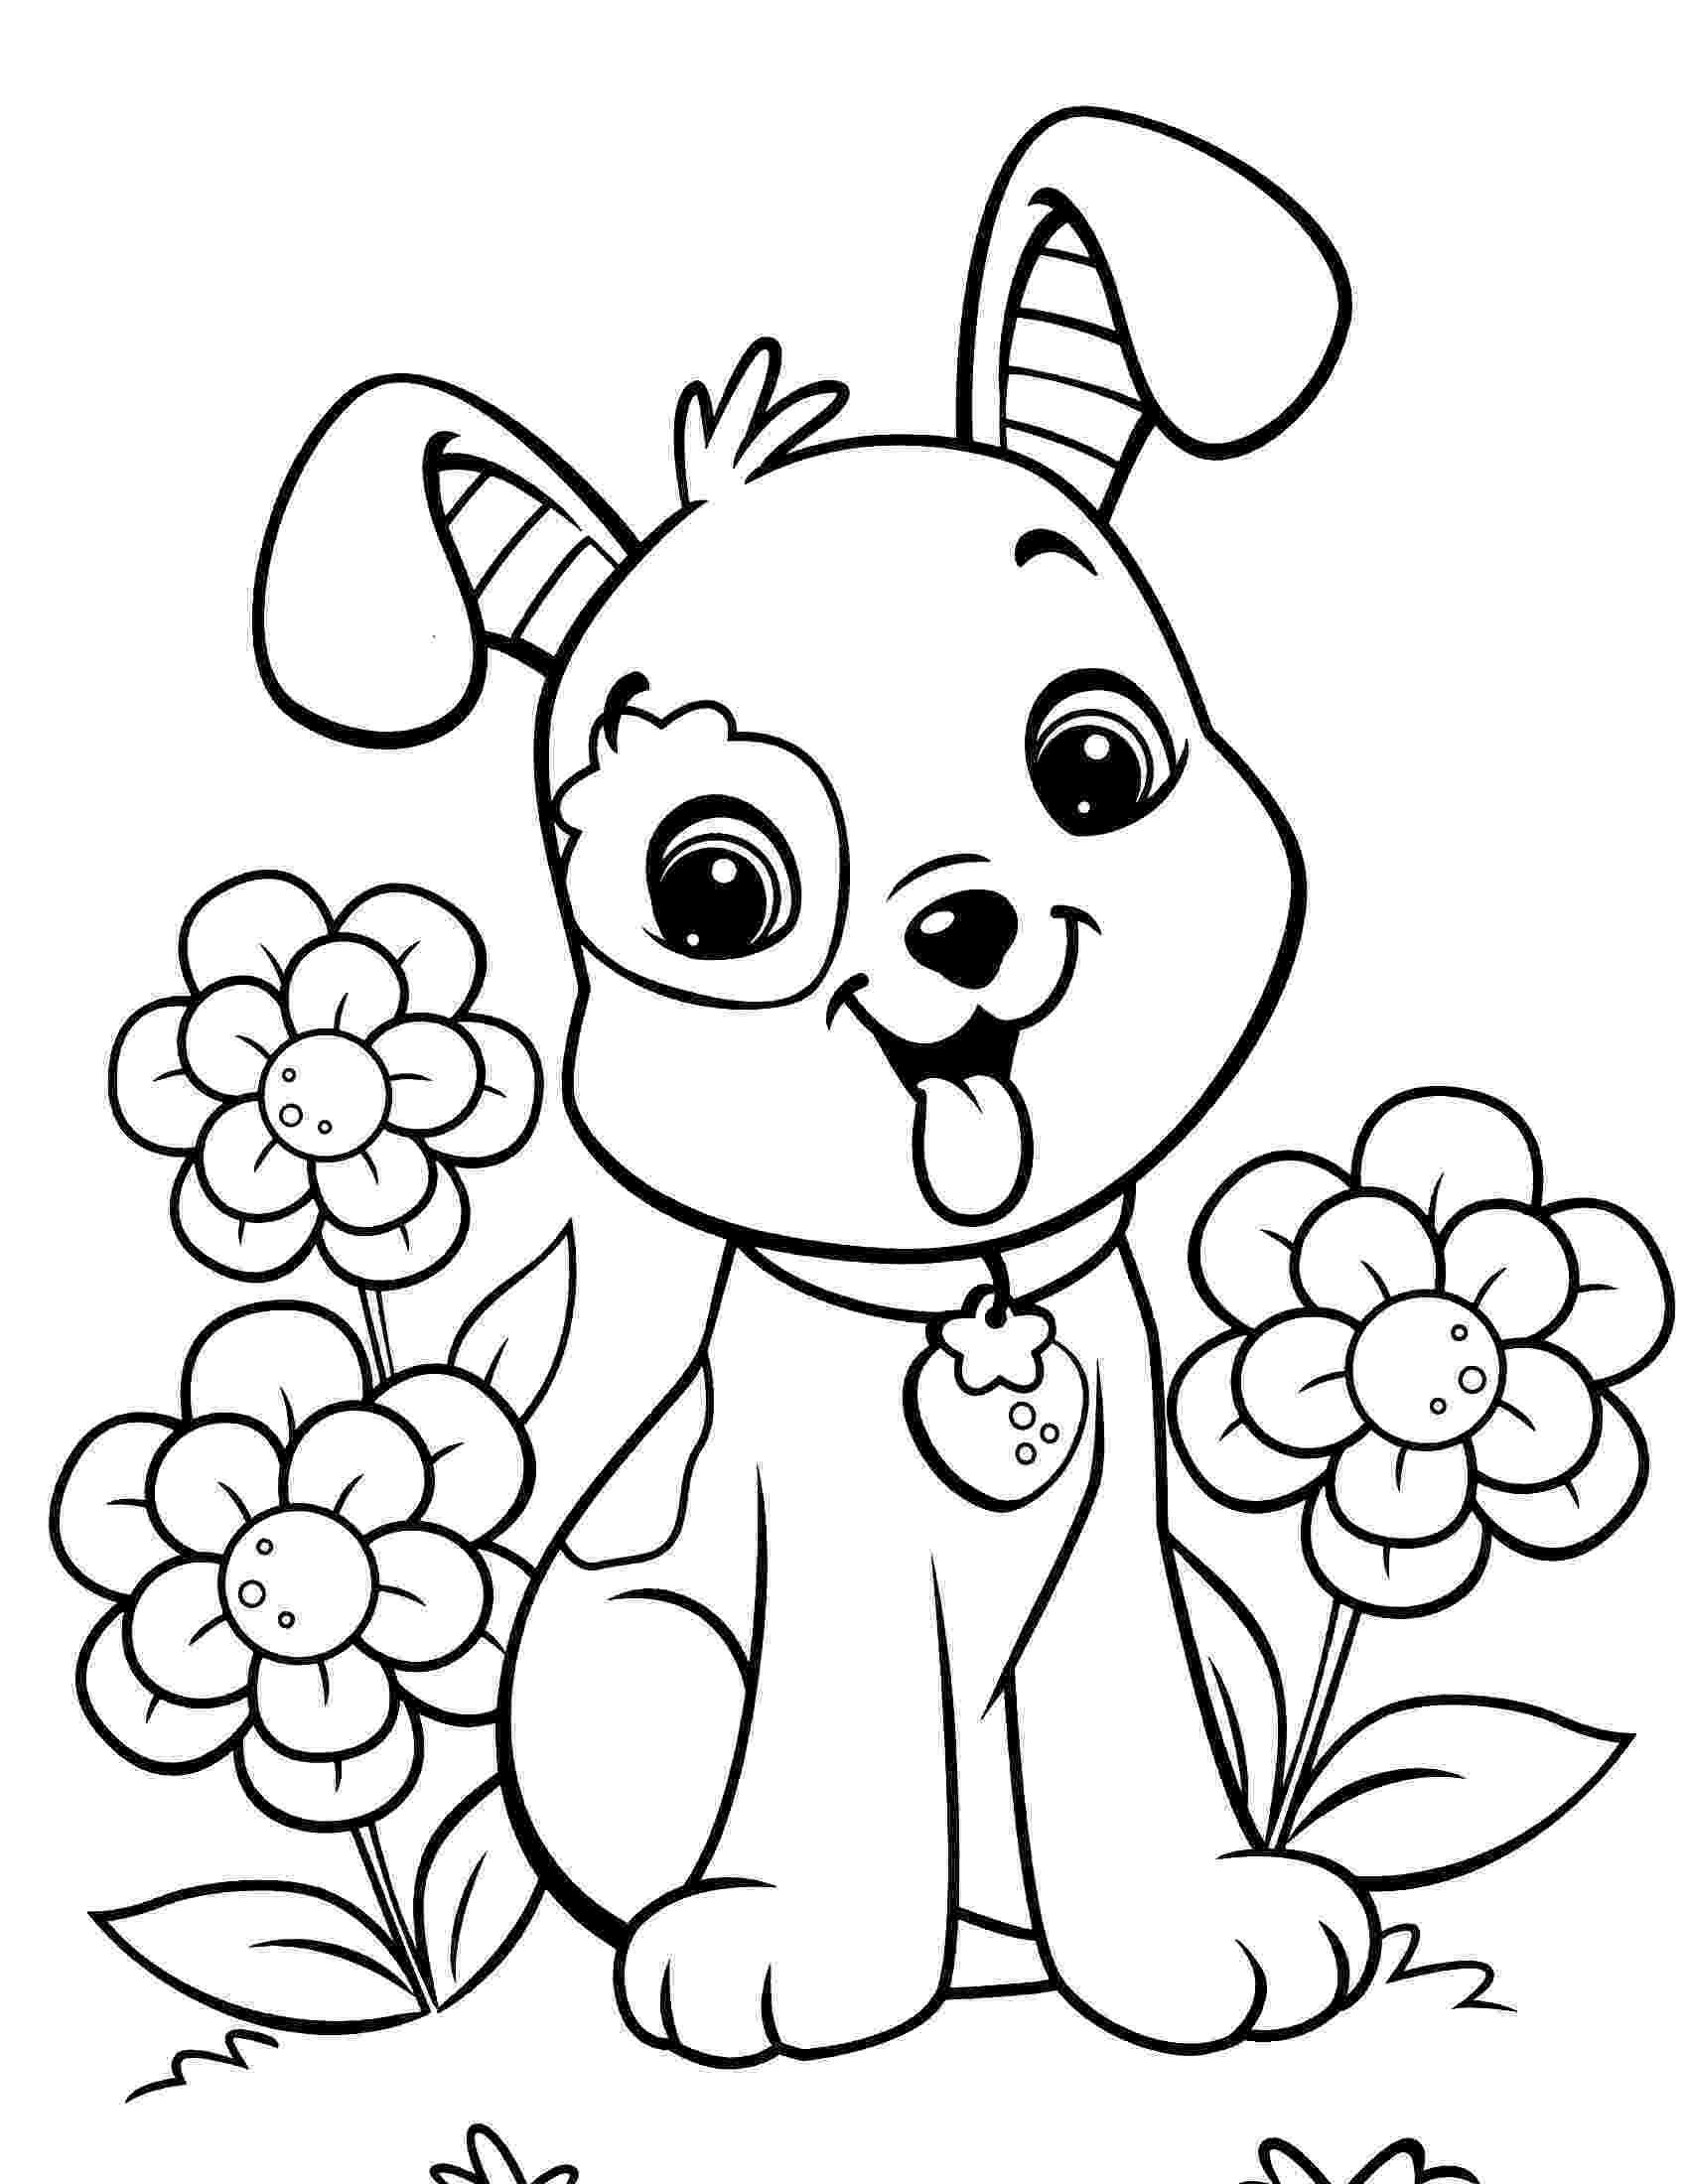 puppy coloring pages puppy coloring pages best coloring pages for kids coloring pages puppy 1 1